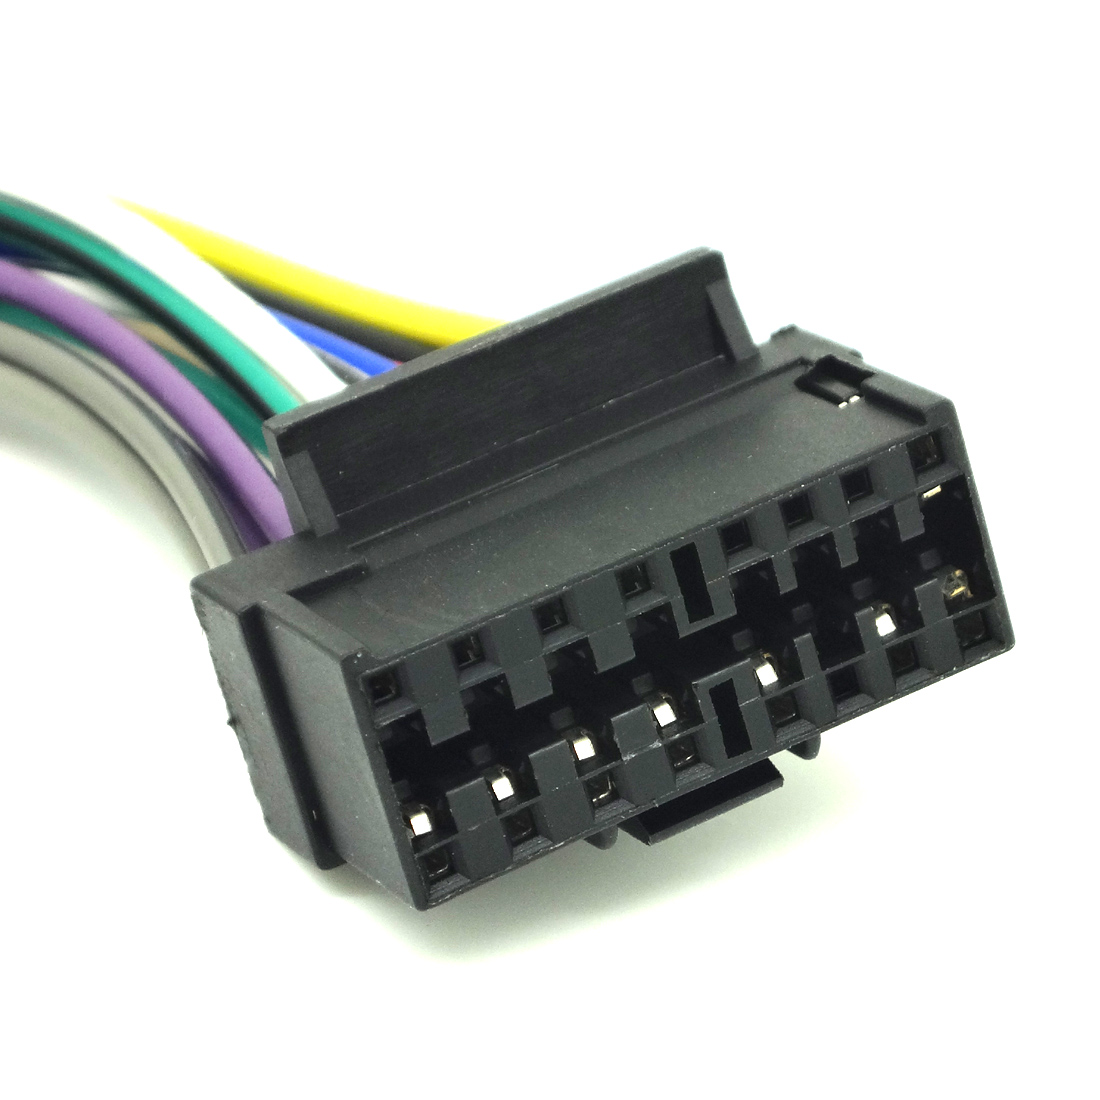 medium resolution of jvc kd g310 wiring diagram wiring diagram 610 radio wire harness for jvc kd